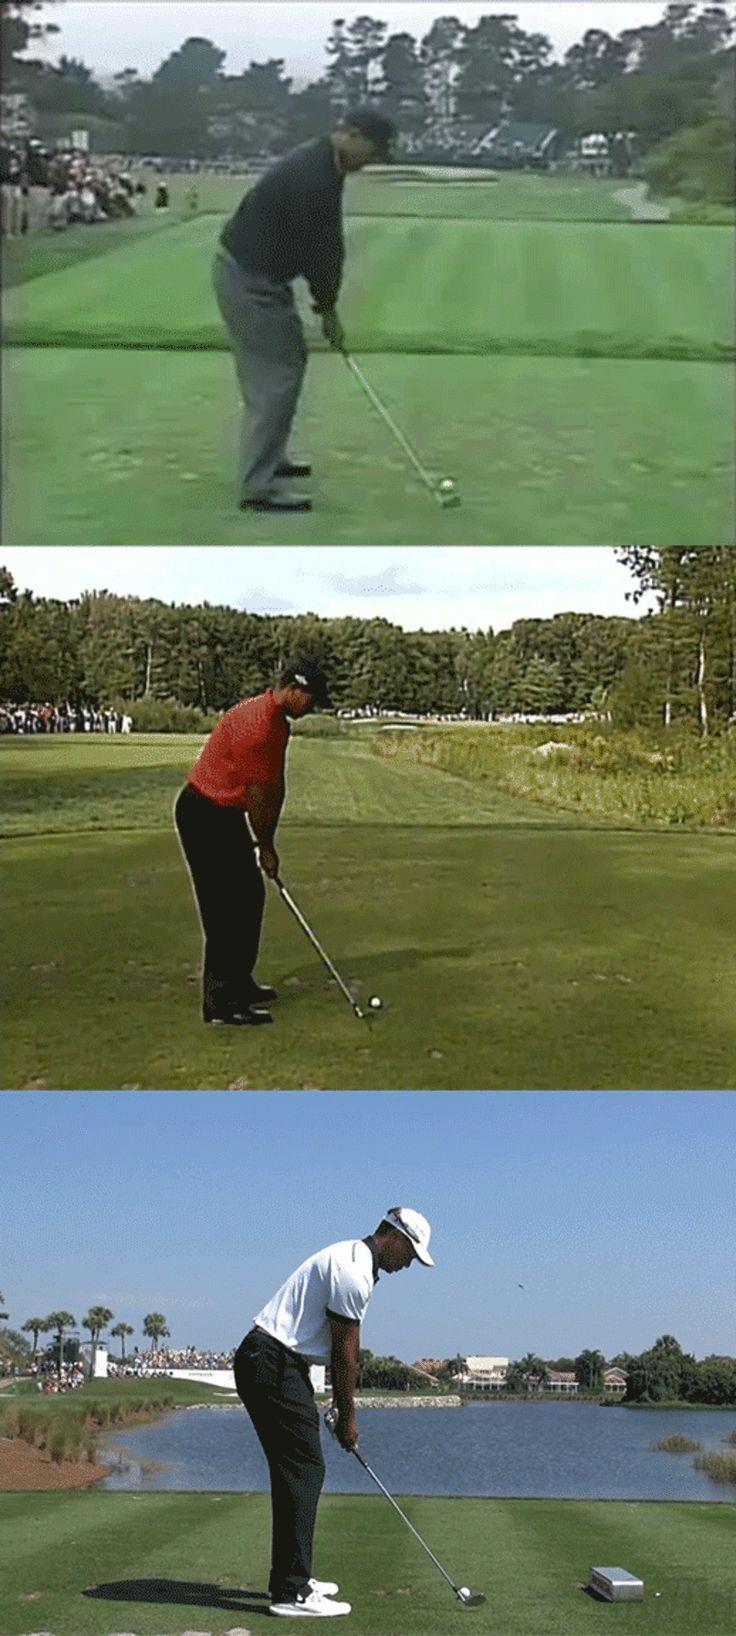 GIF: Tiger Woods' golf swing with Butch vs. Haney vs. Foley - Golf Digest